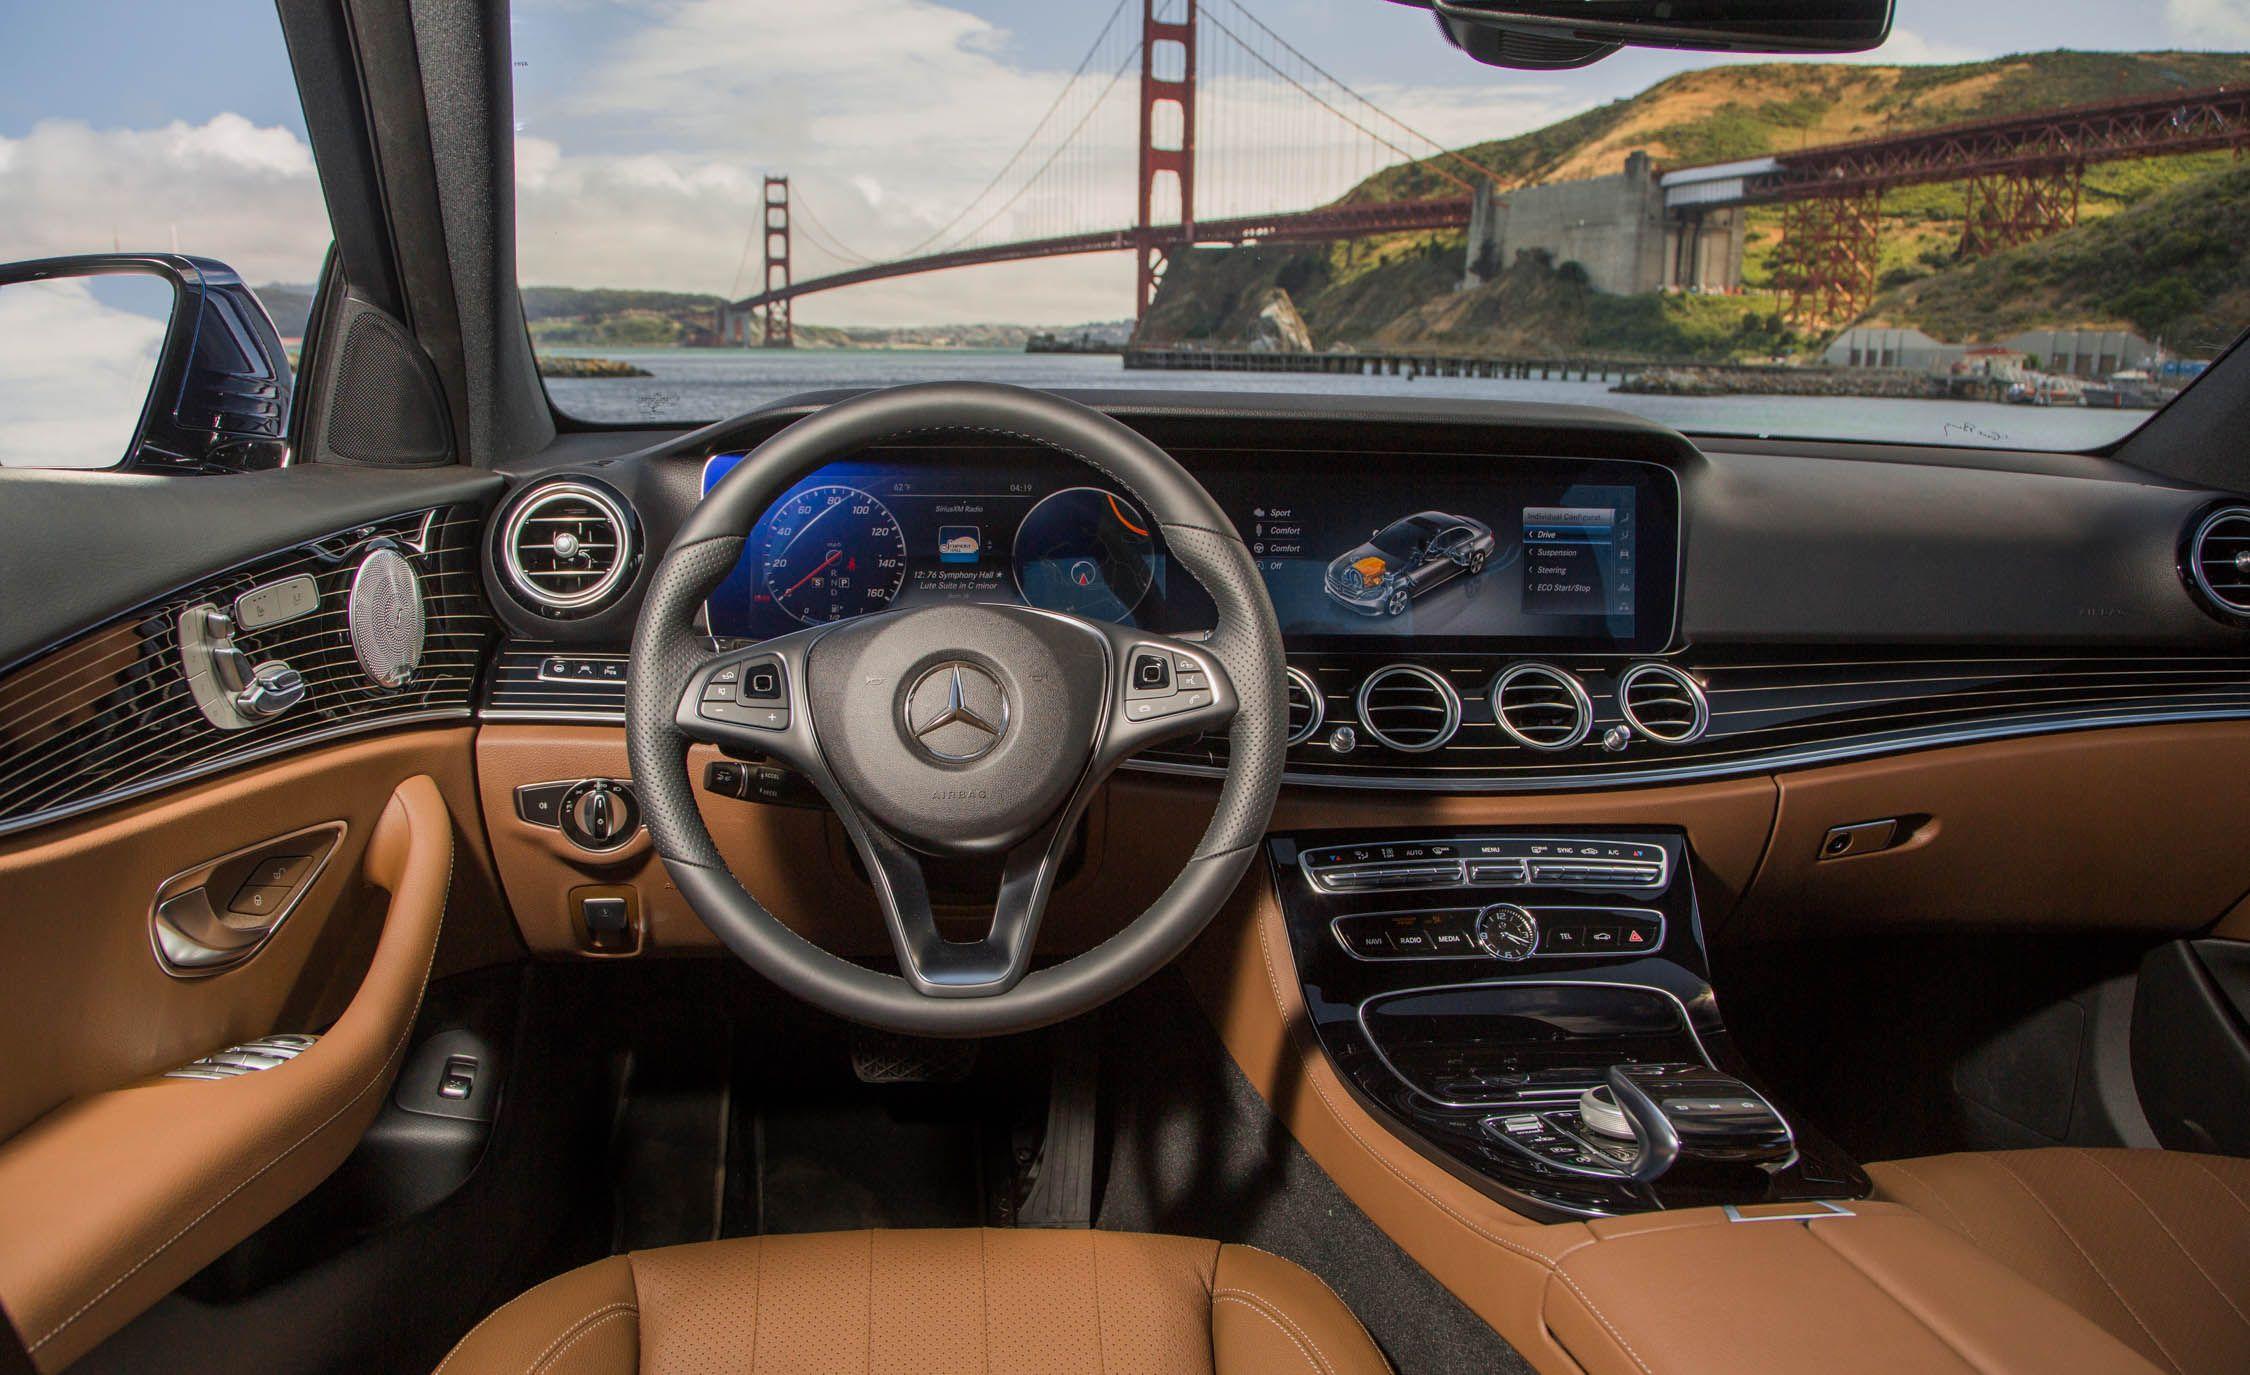 2018 Mercedes-Benz E-class sedan Review – Interior and Passenger Space